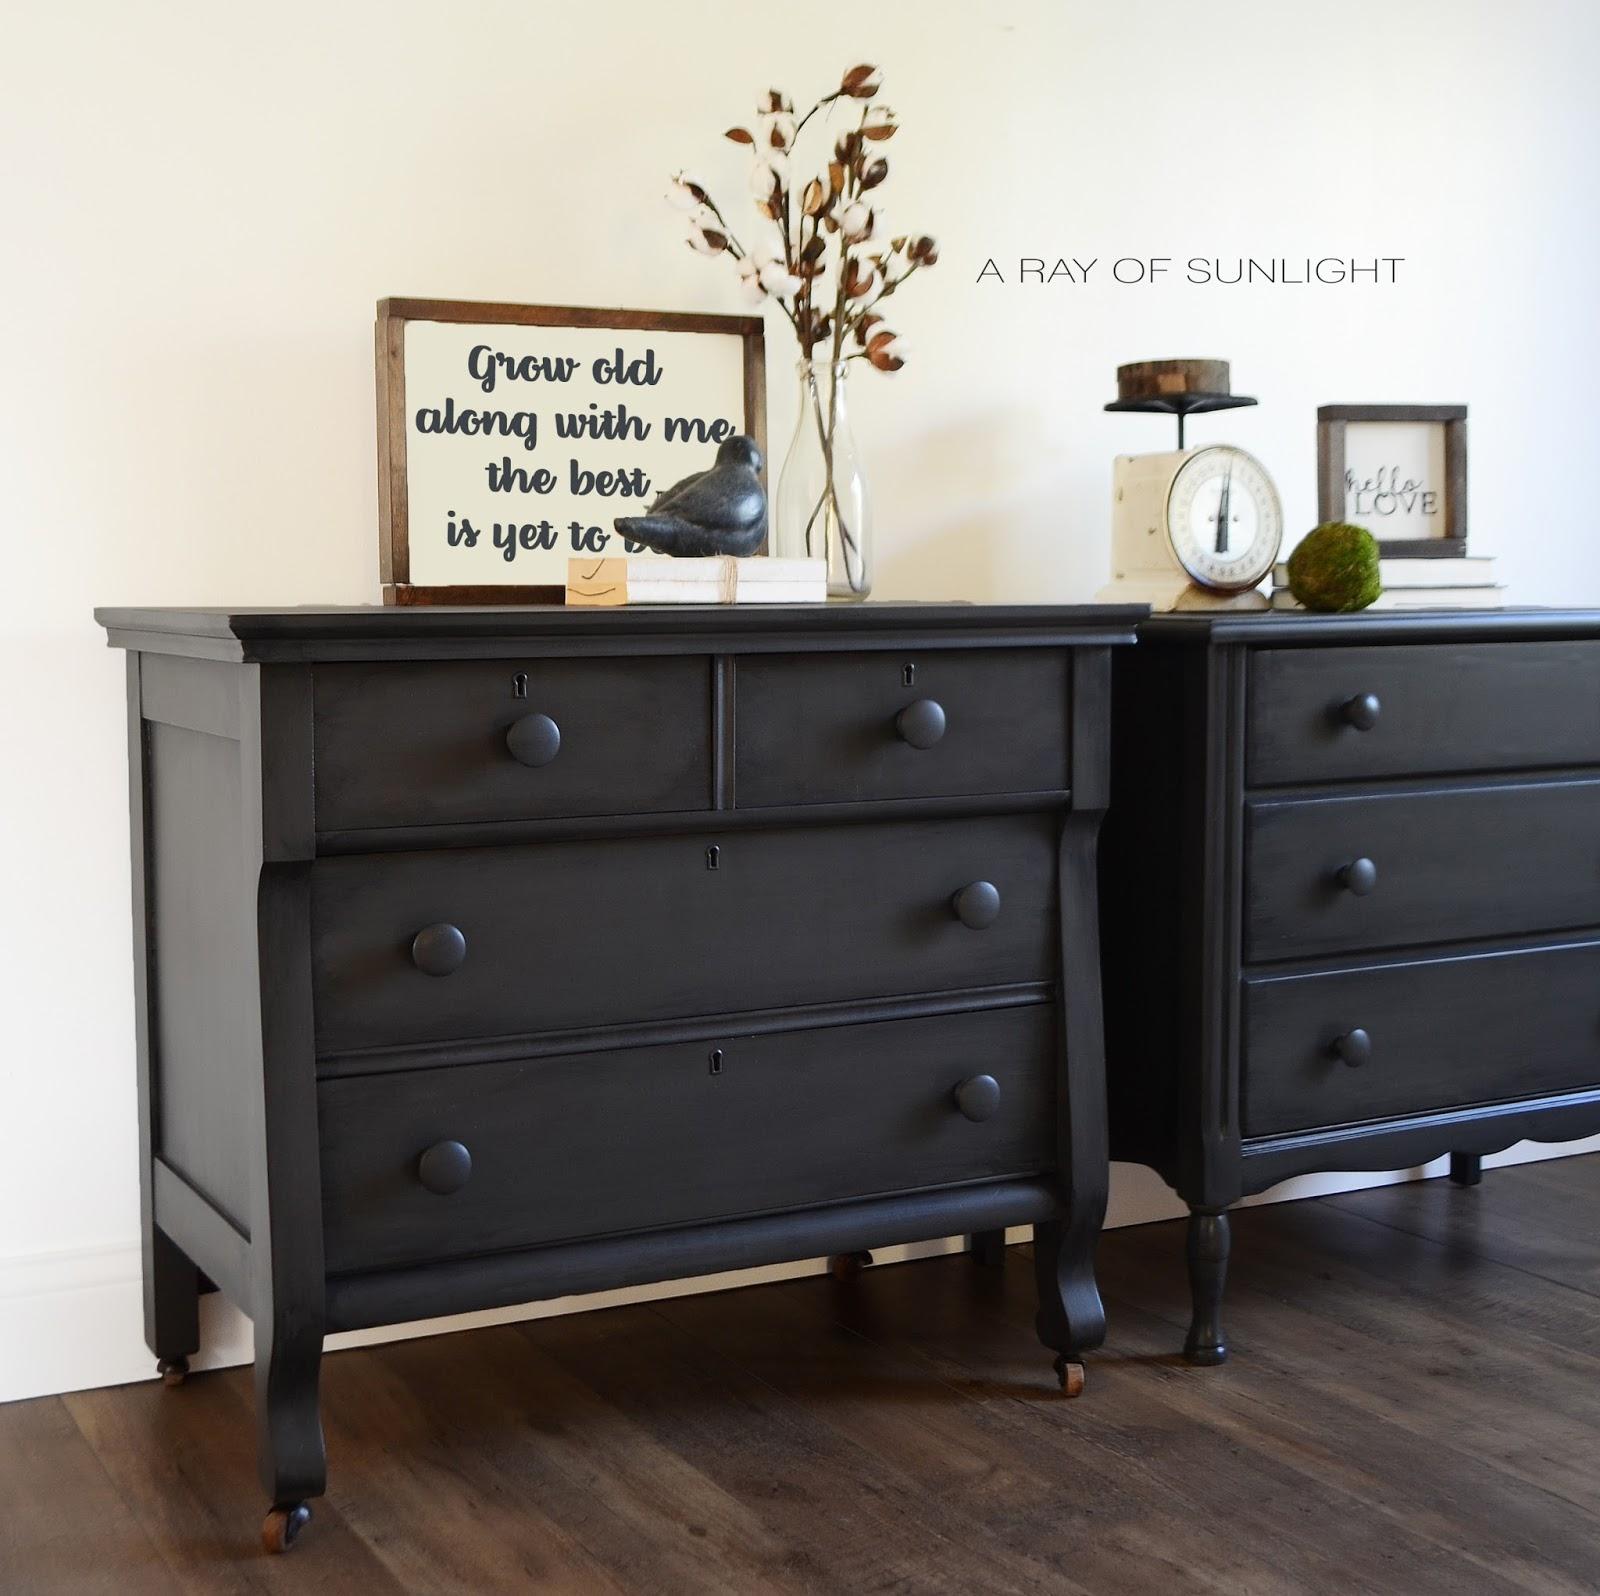 hers mismatched nightstands in deep grey